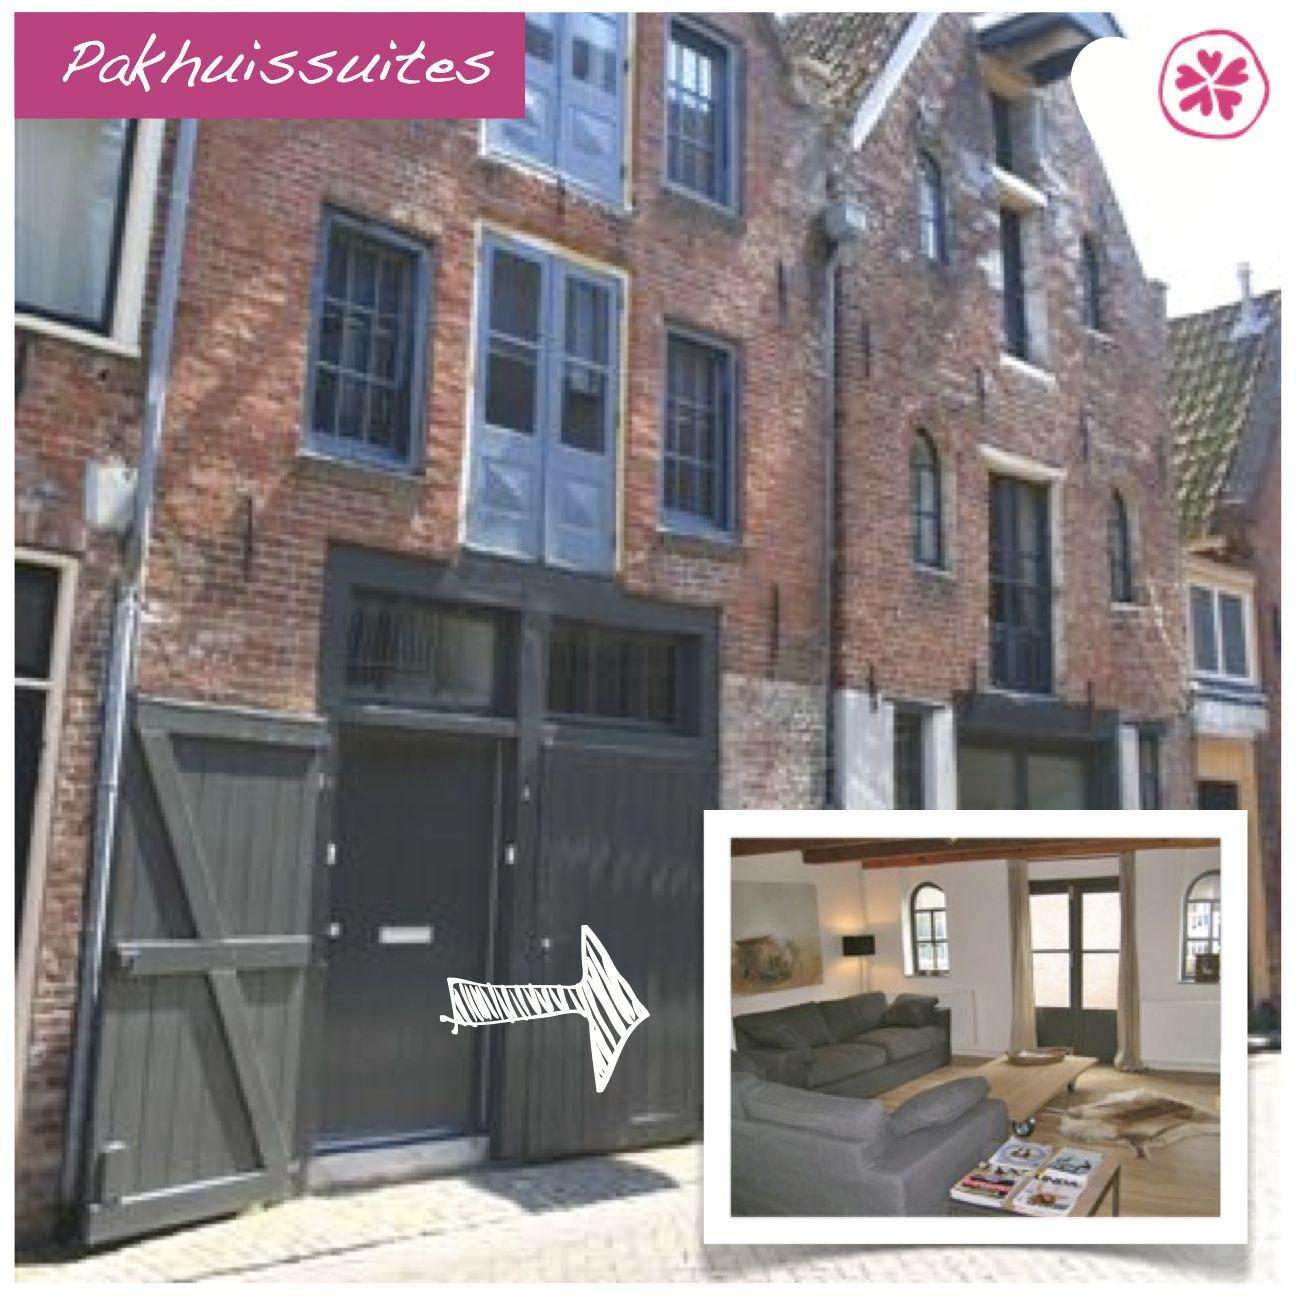 Vakantiewoning Erve Ensink in Drenthe. Prachtige vakantiewoning op ...